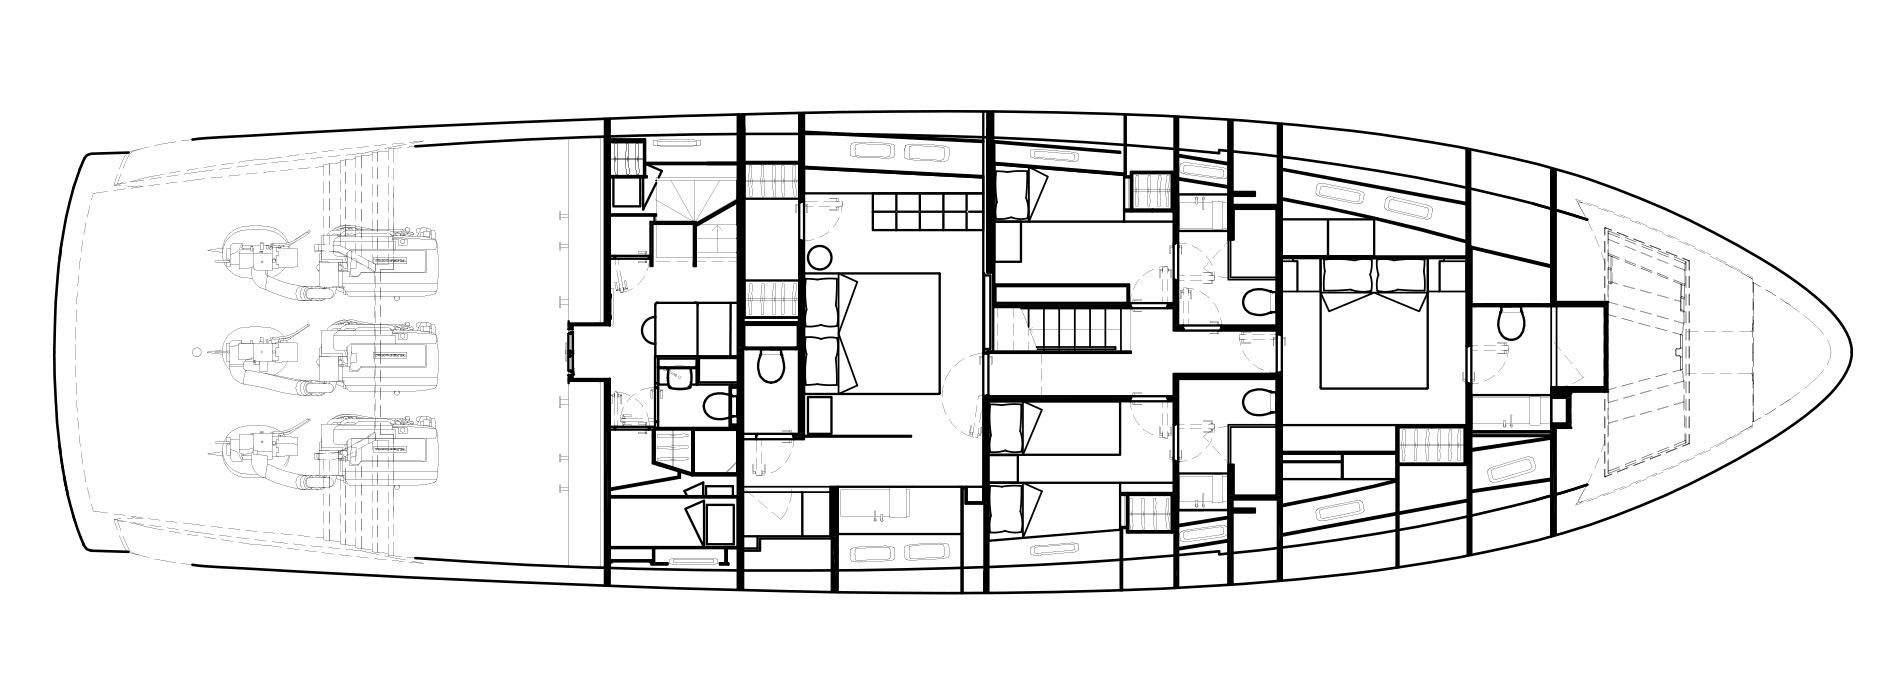 Sanlorenzo Yachts SX88 Нижняя палуба версия Lissoni